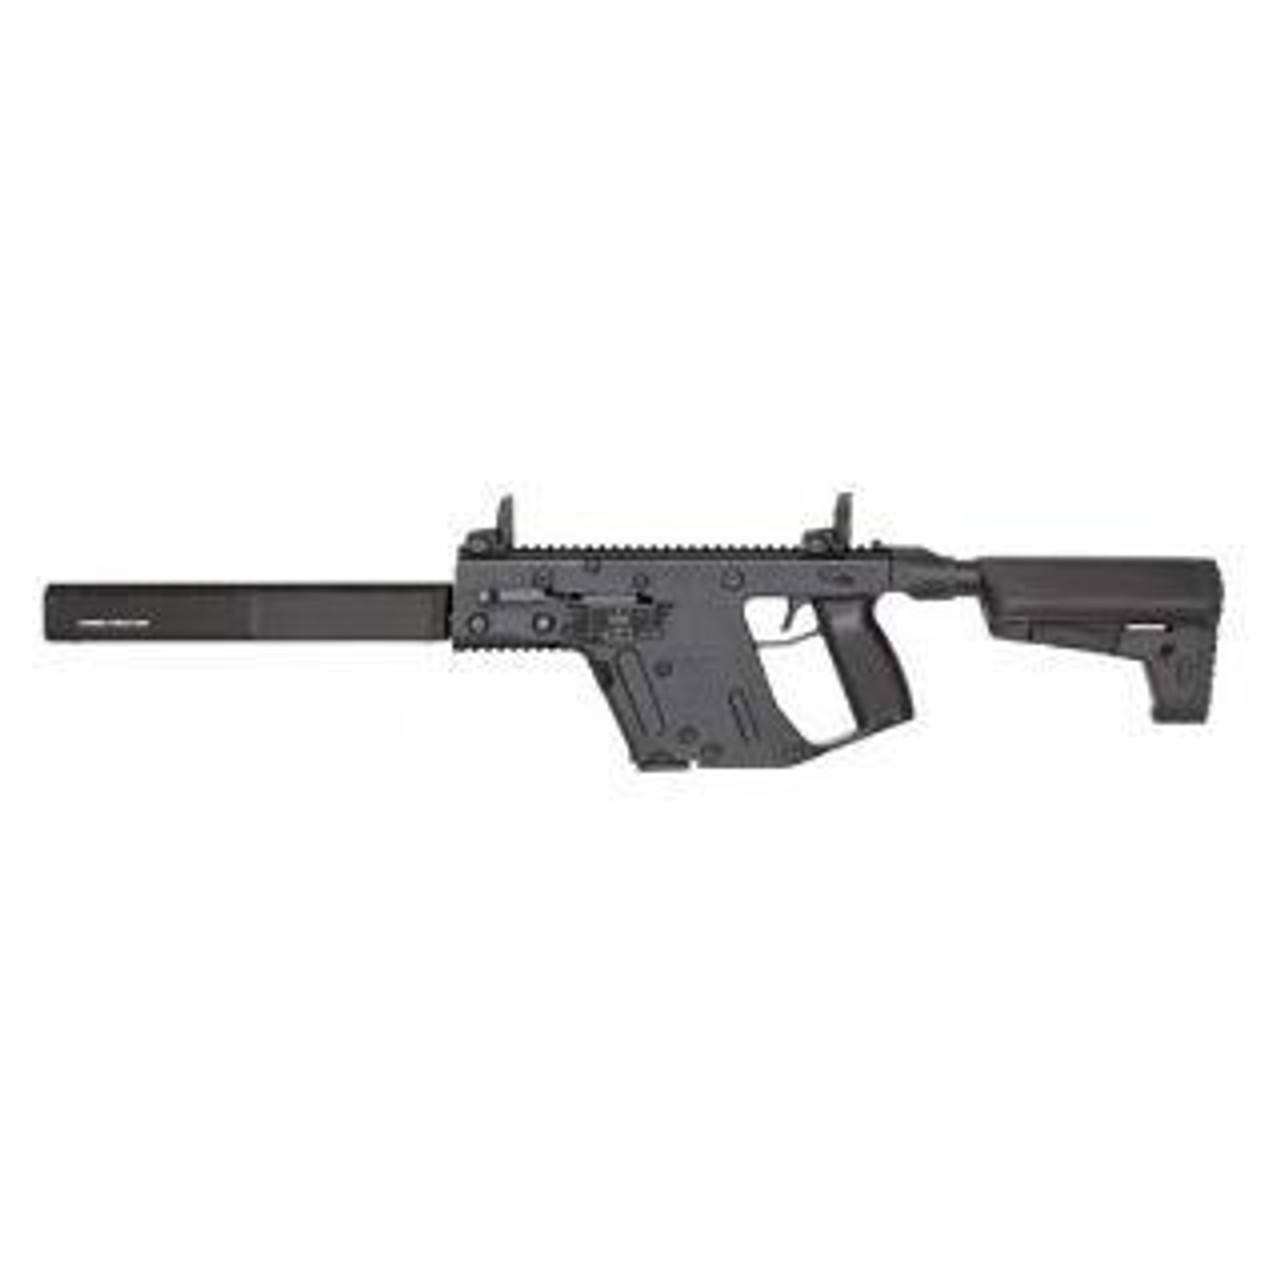 Kriss Vector CRB CALIFORNIA LEGAL- 10mm